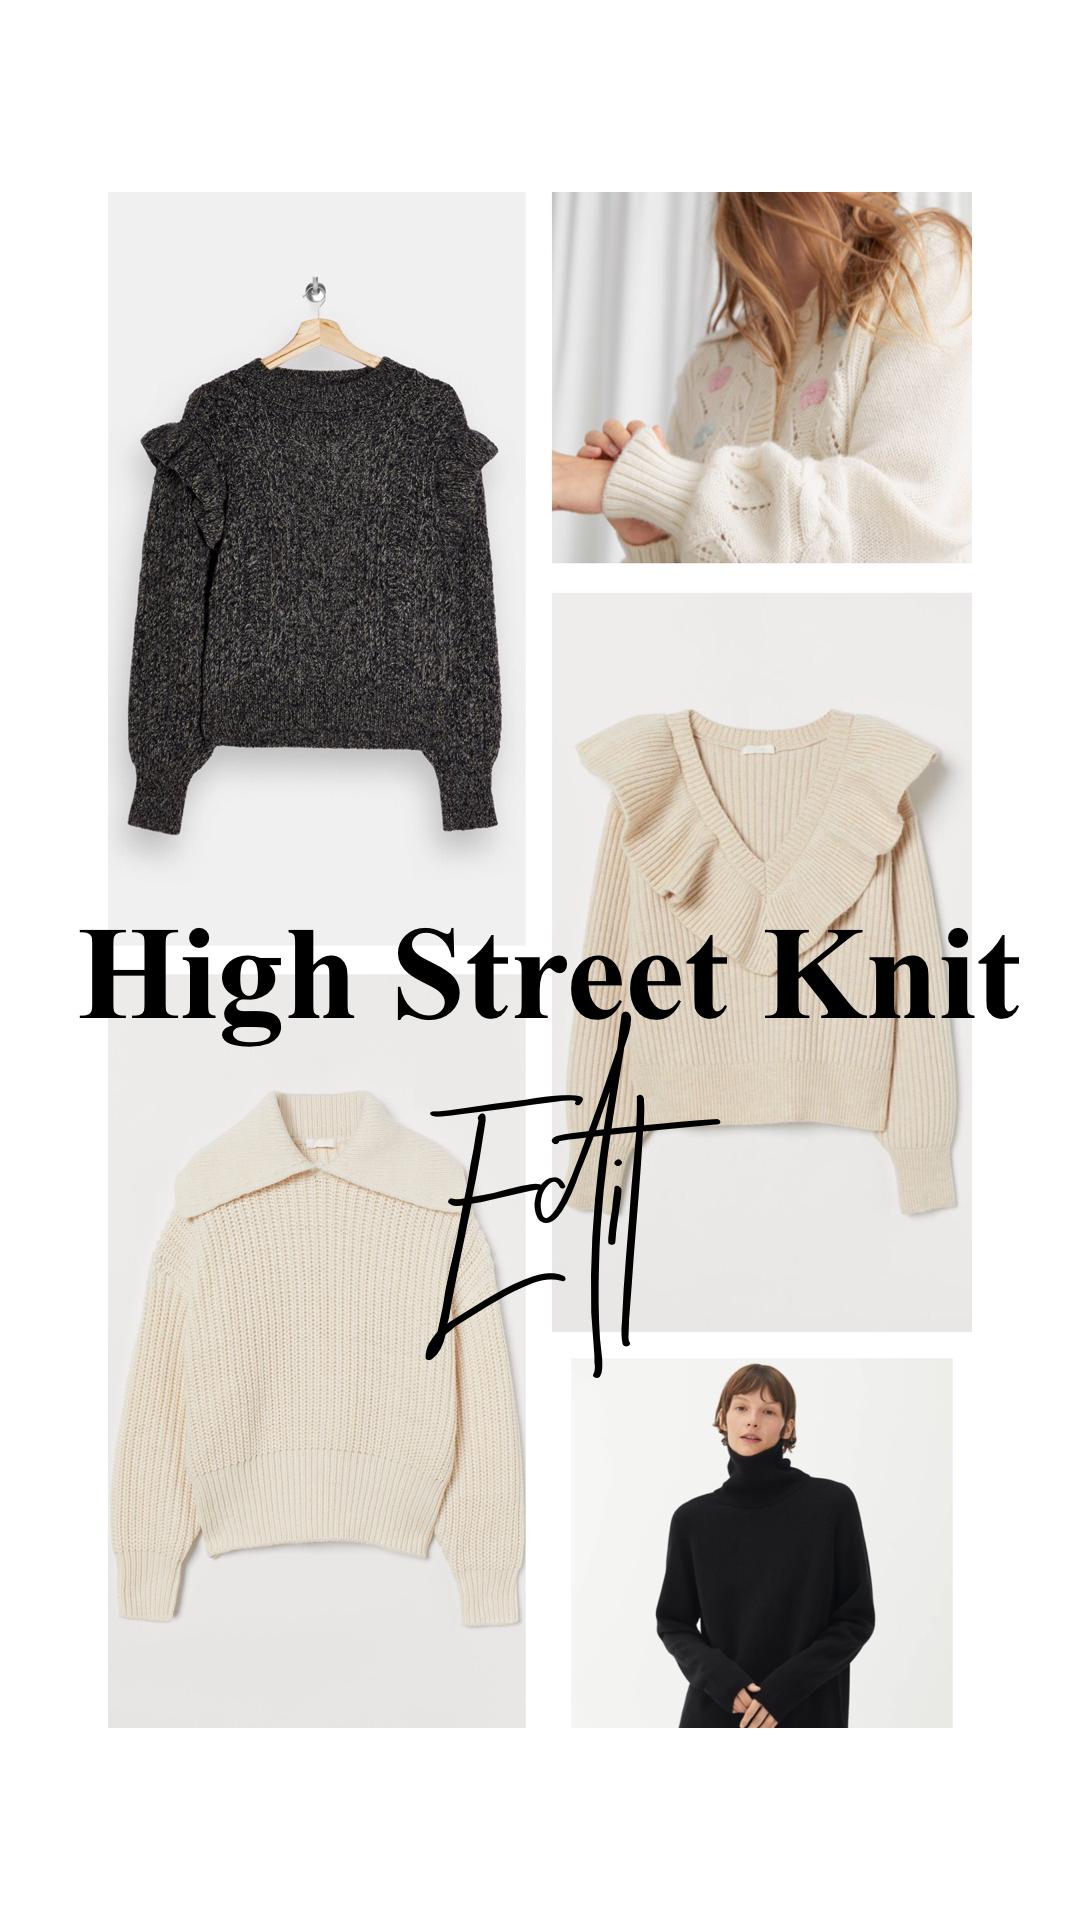 Best High Street Knit Wear This Winter